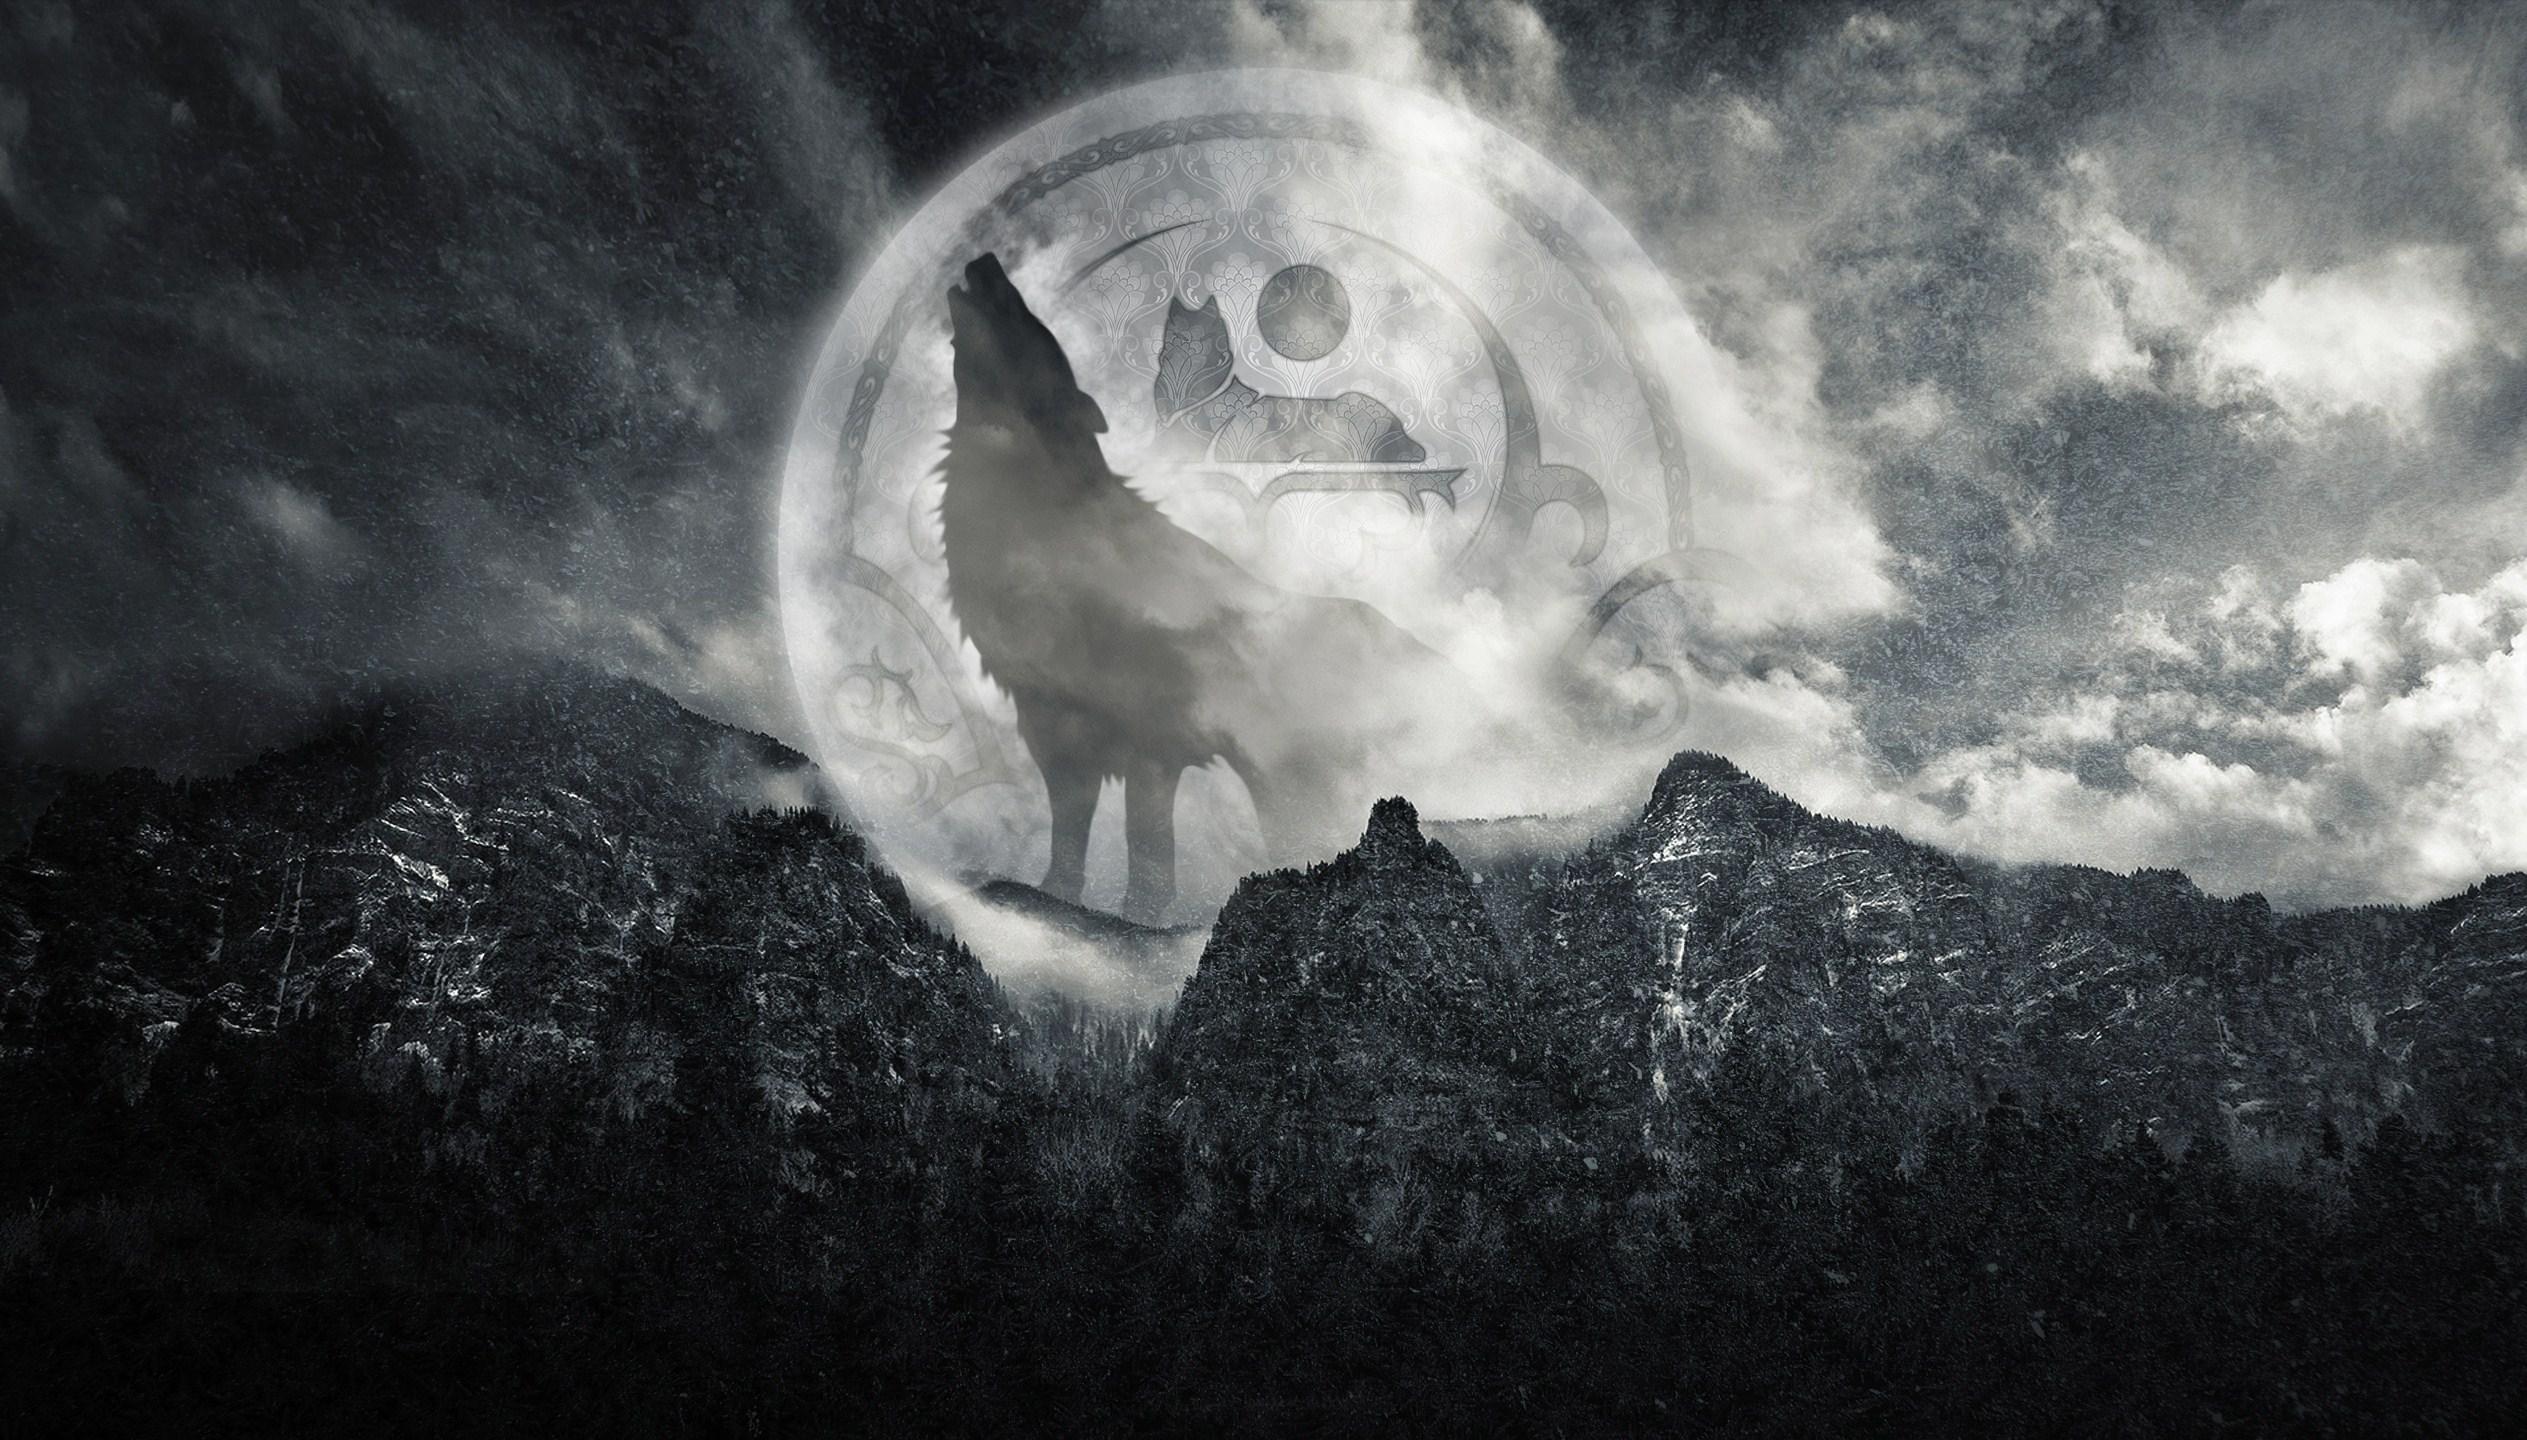 Wolf Computer Wallpapers Desktop Backgrounds 2527x1440 ID394014 2527x1440